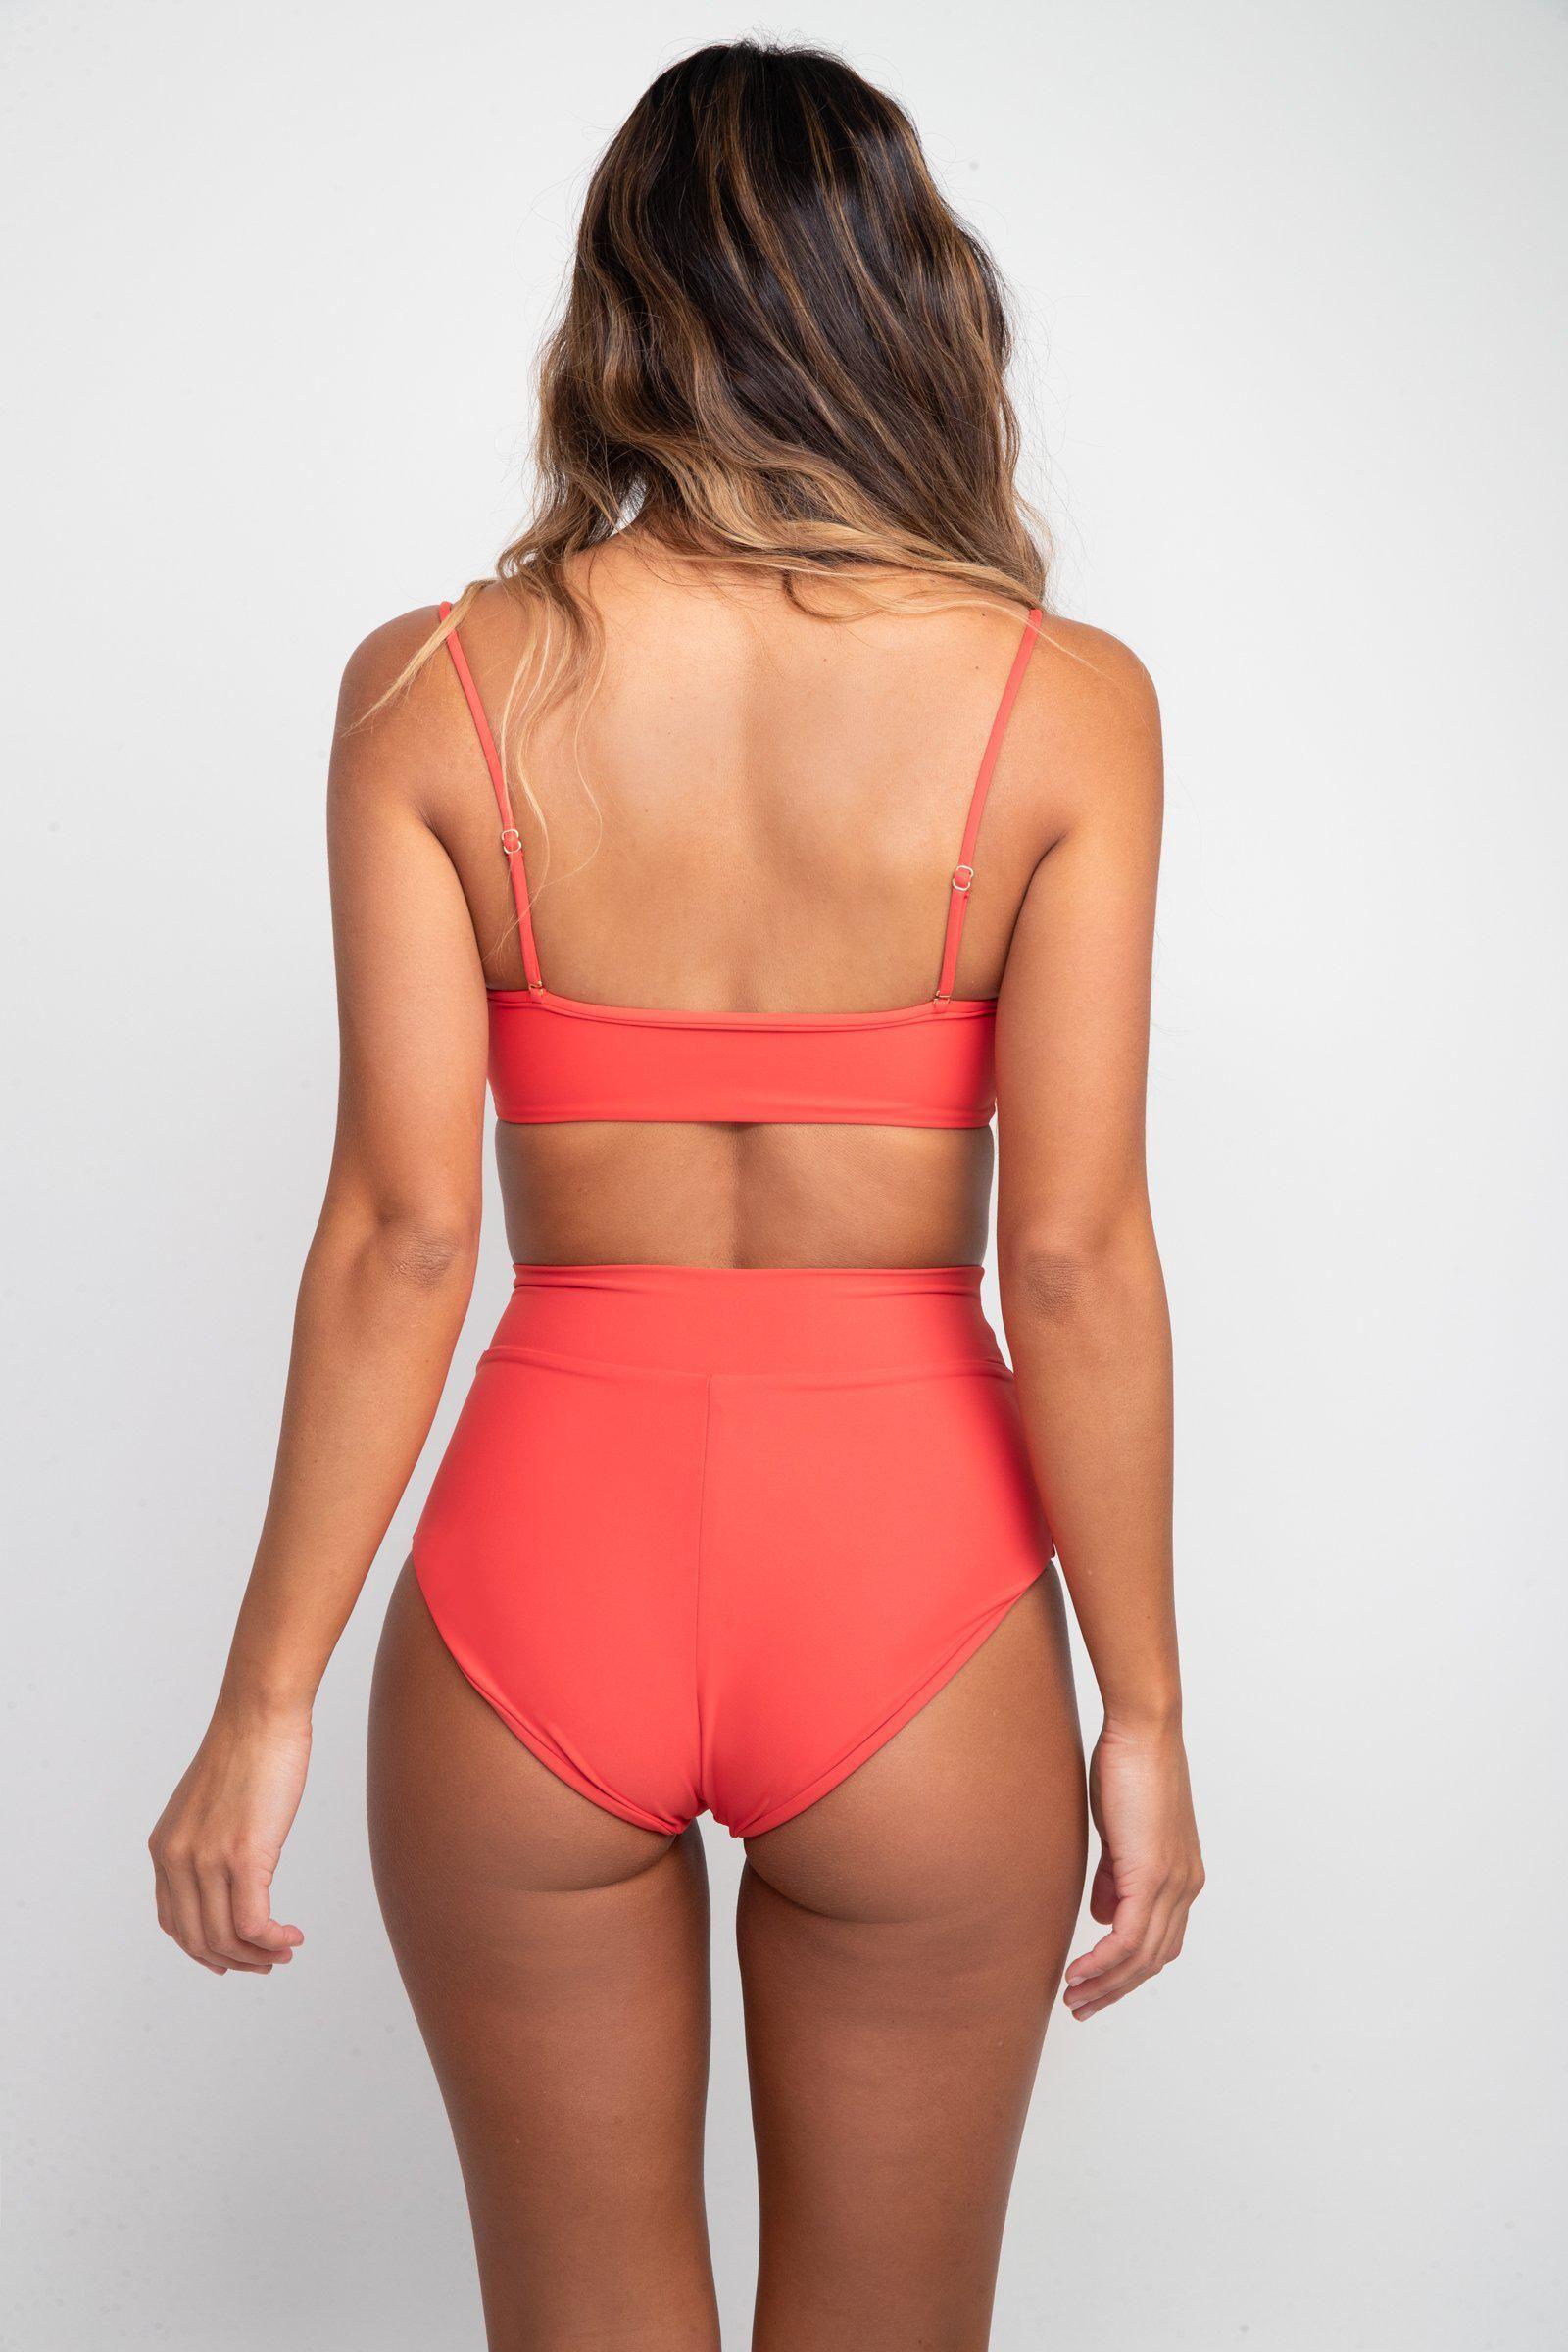 Scarlette Bottom - Red